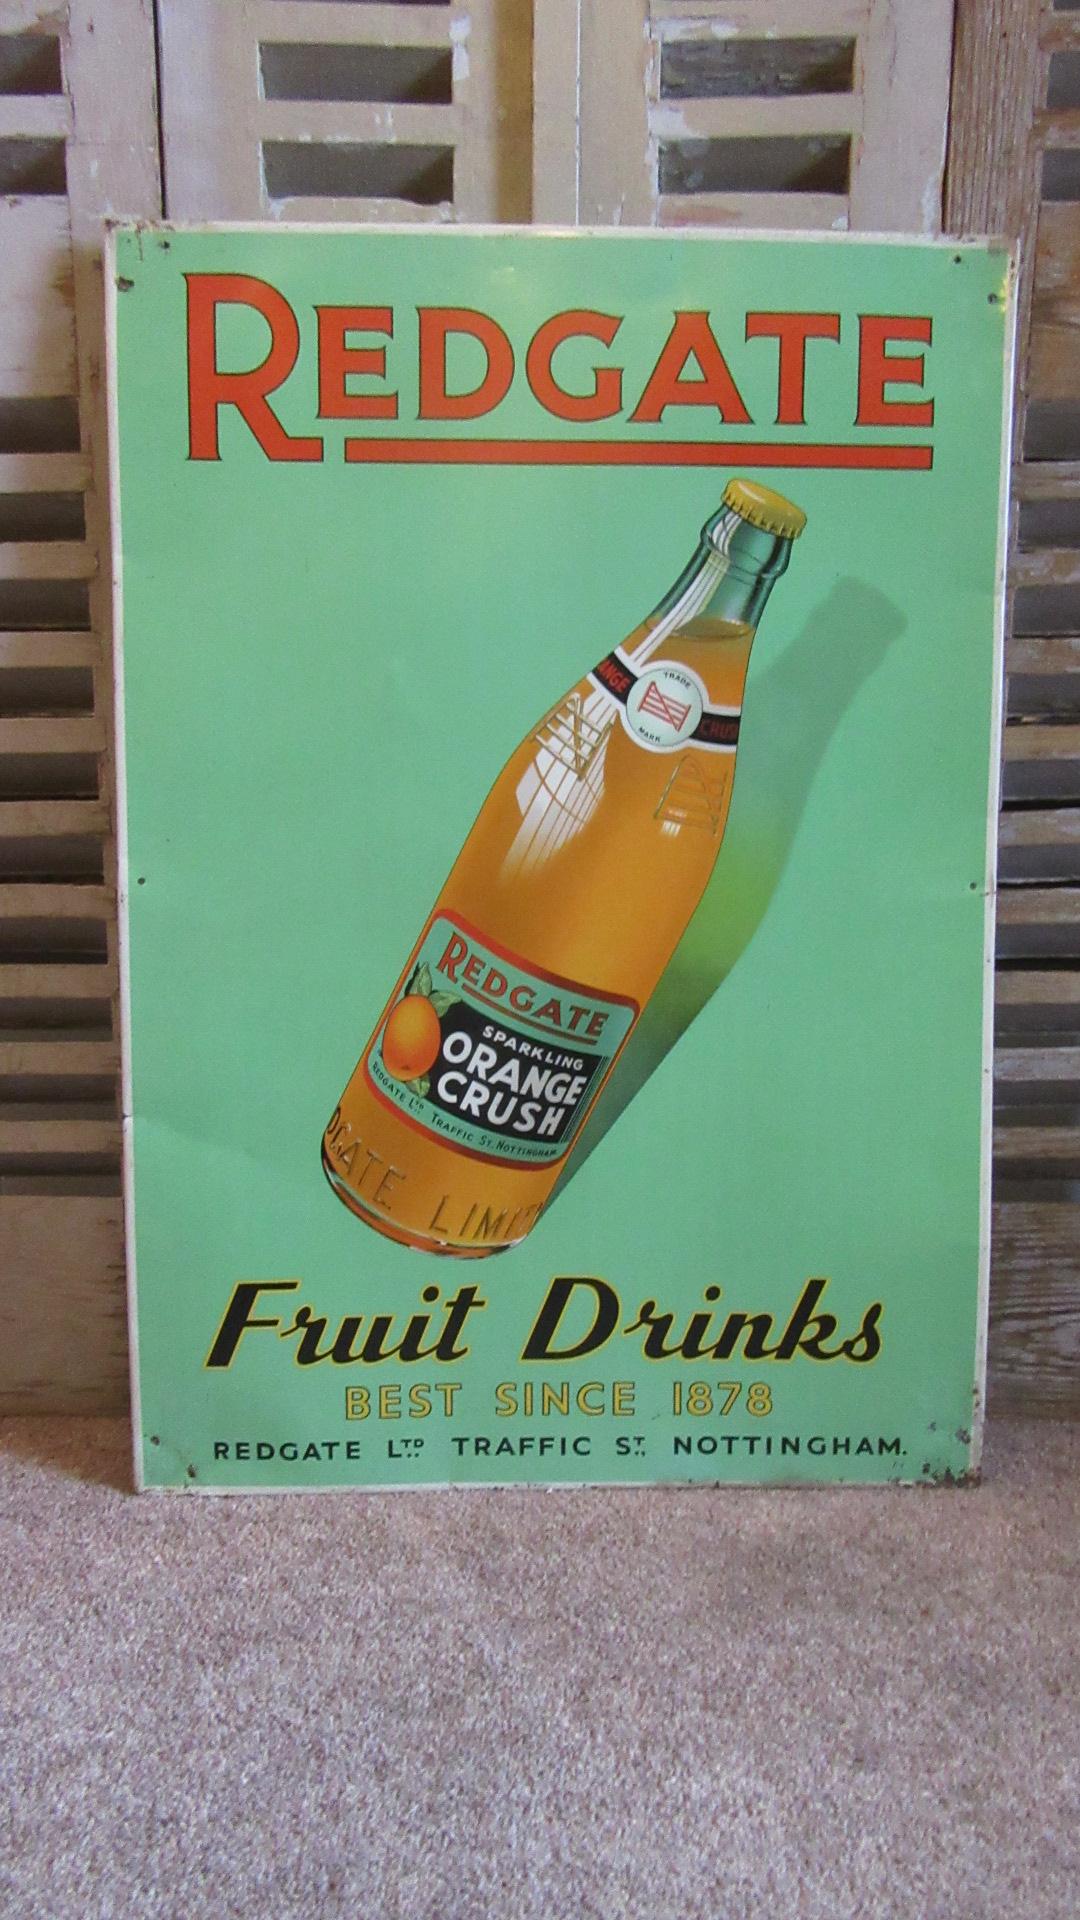 VINTAGE REDGATE DRINKS TIN ADVERTISING SIGN